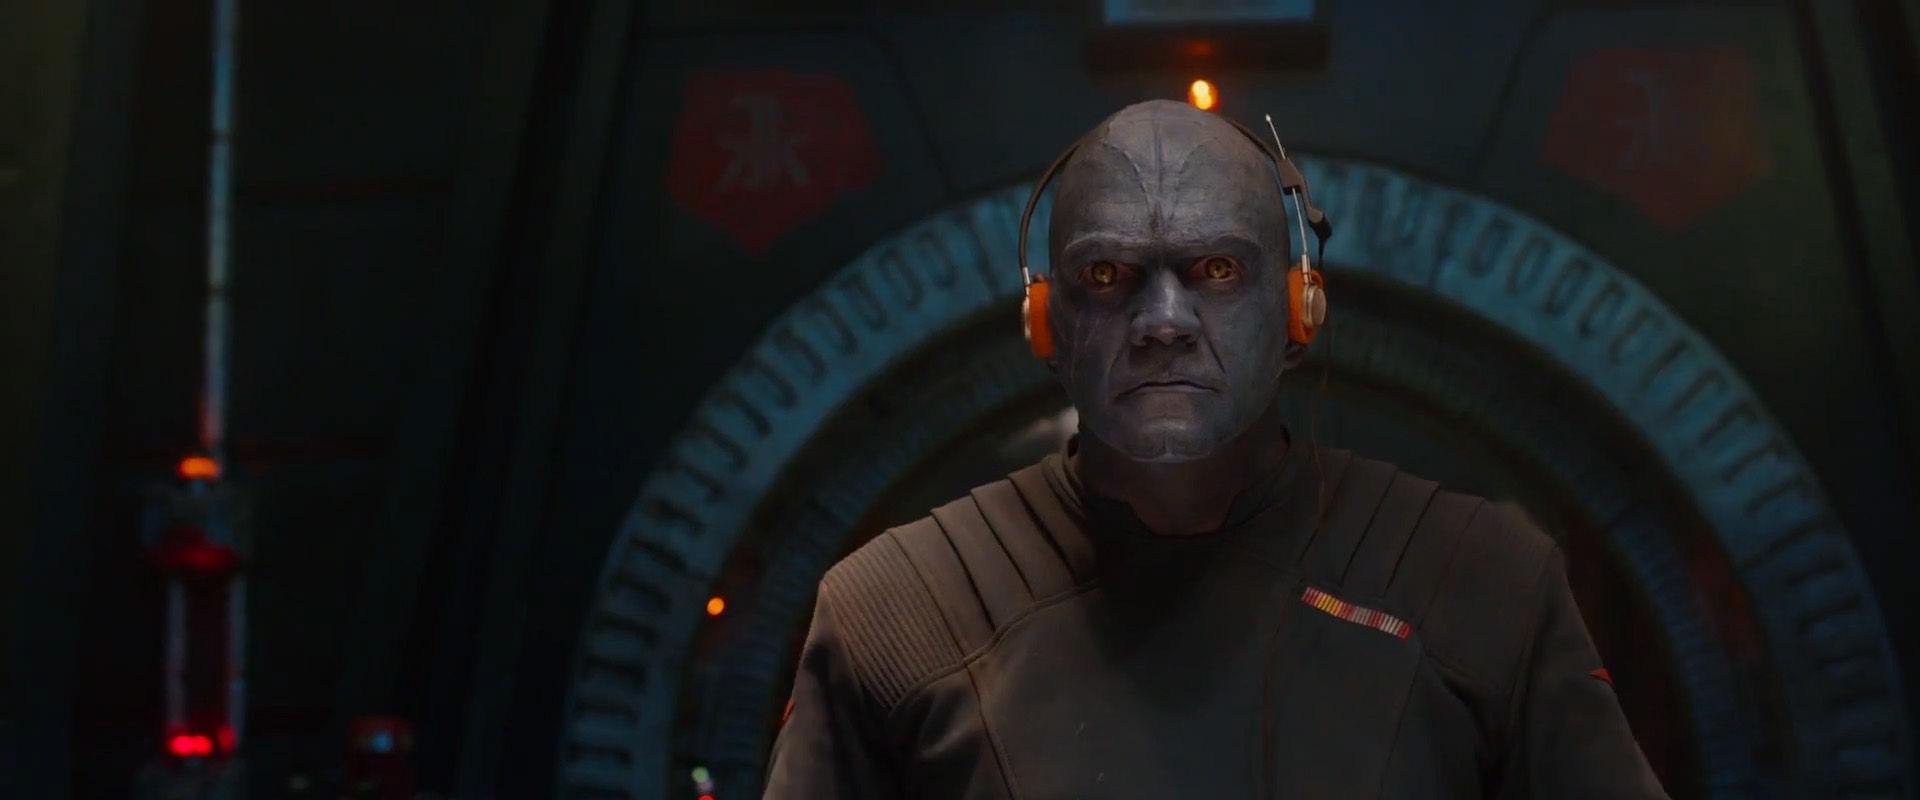 Guardians-of-the-Galaxy-Prison-Guard-Walkman.jpg